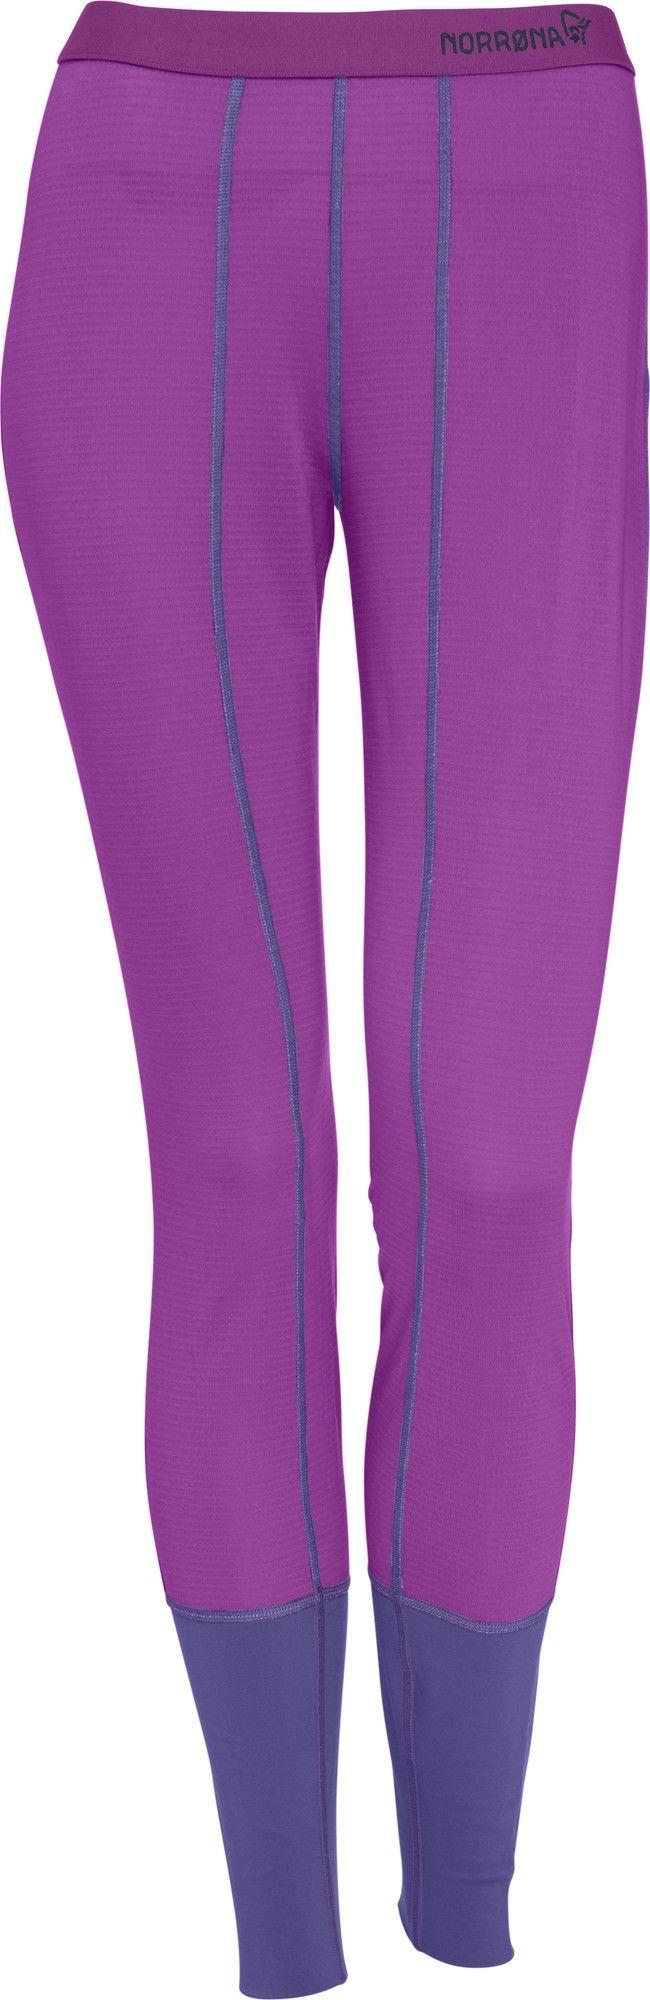 Norrona Super Longs Lila/Violett, Female Polartec® S -Farbe Royal Lush, S